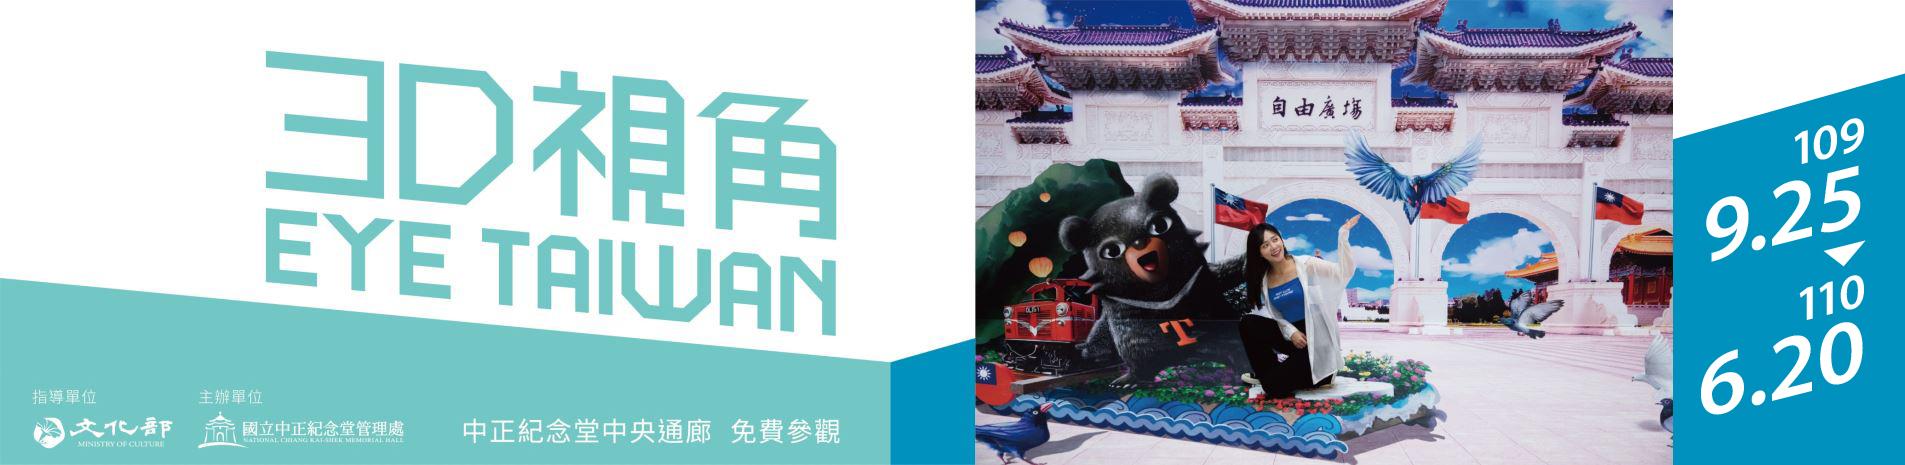 TAIWAN 3D ART(Free Admission)